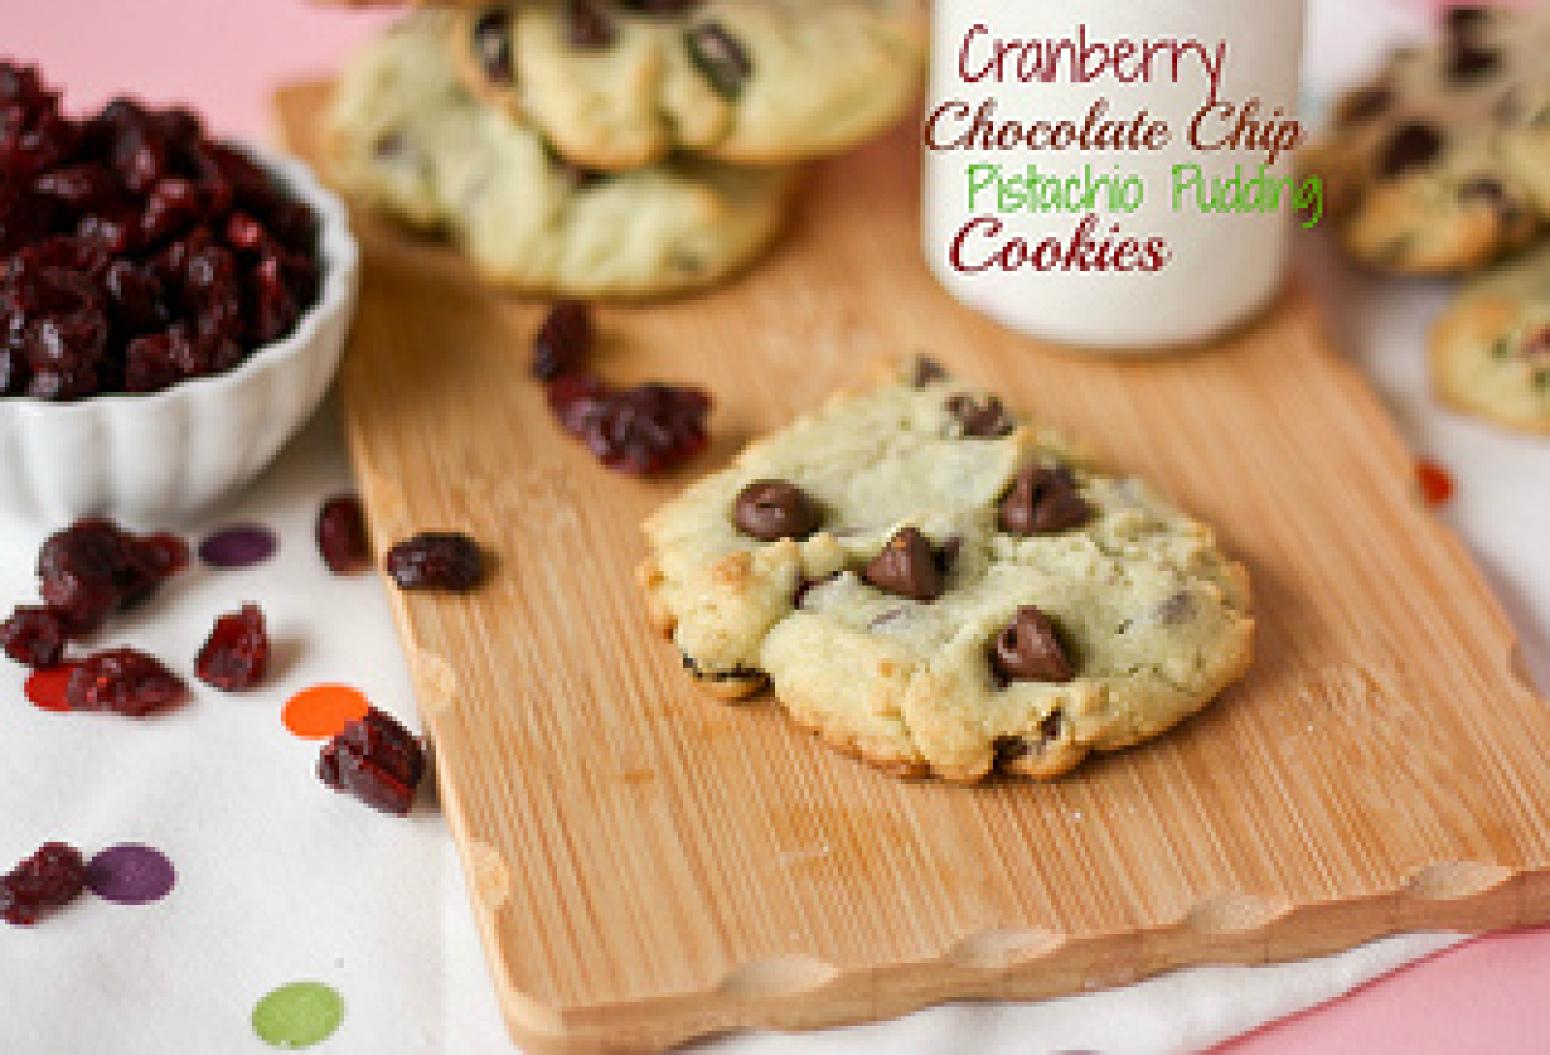 Cranberry Chocolate Chip Pistachio Pudding Cookies Recipe ...